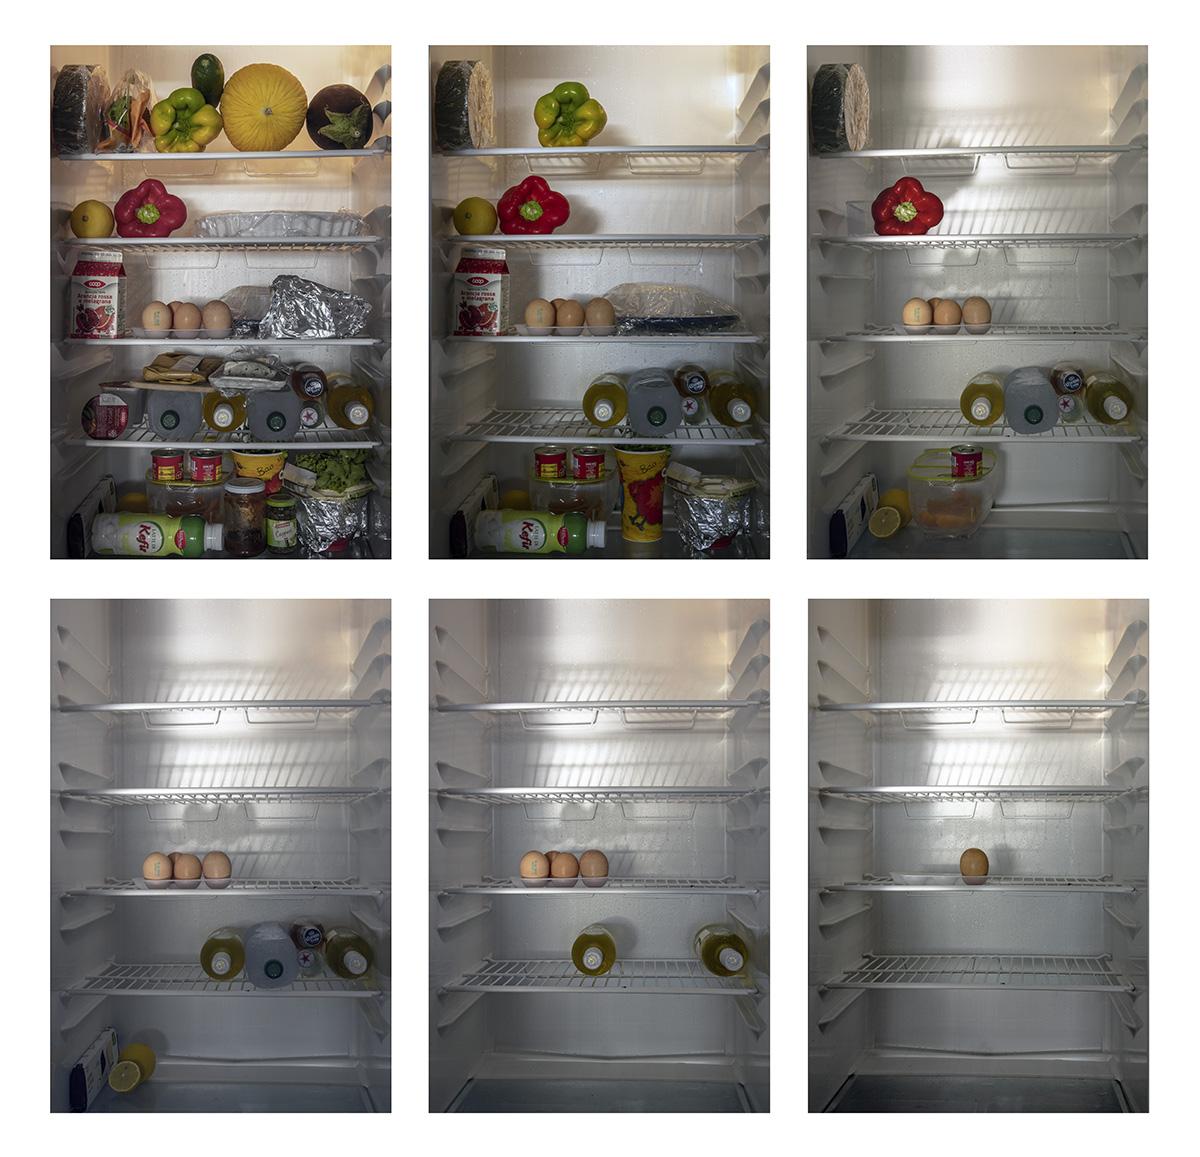 Gaia frigorifero 83×80